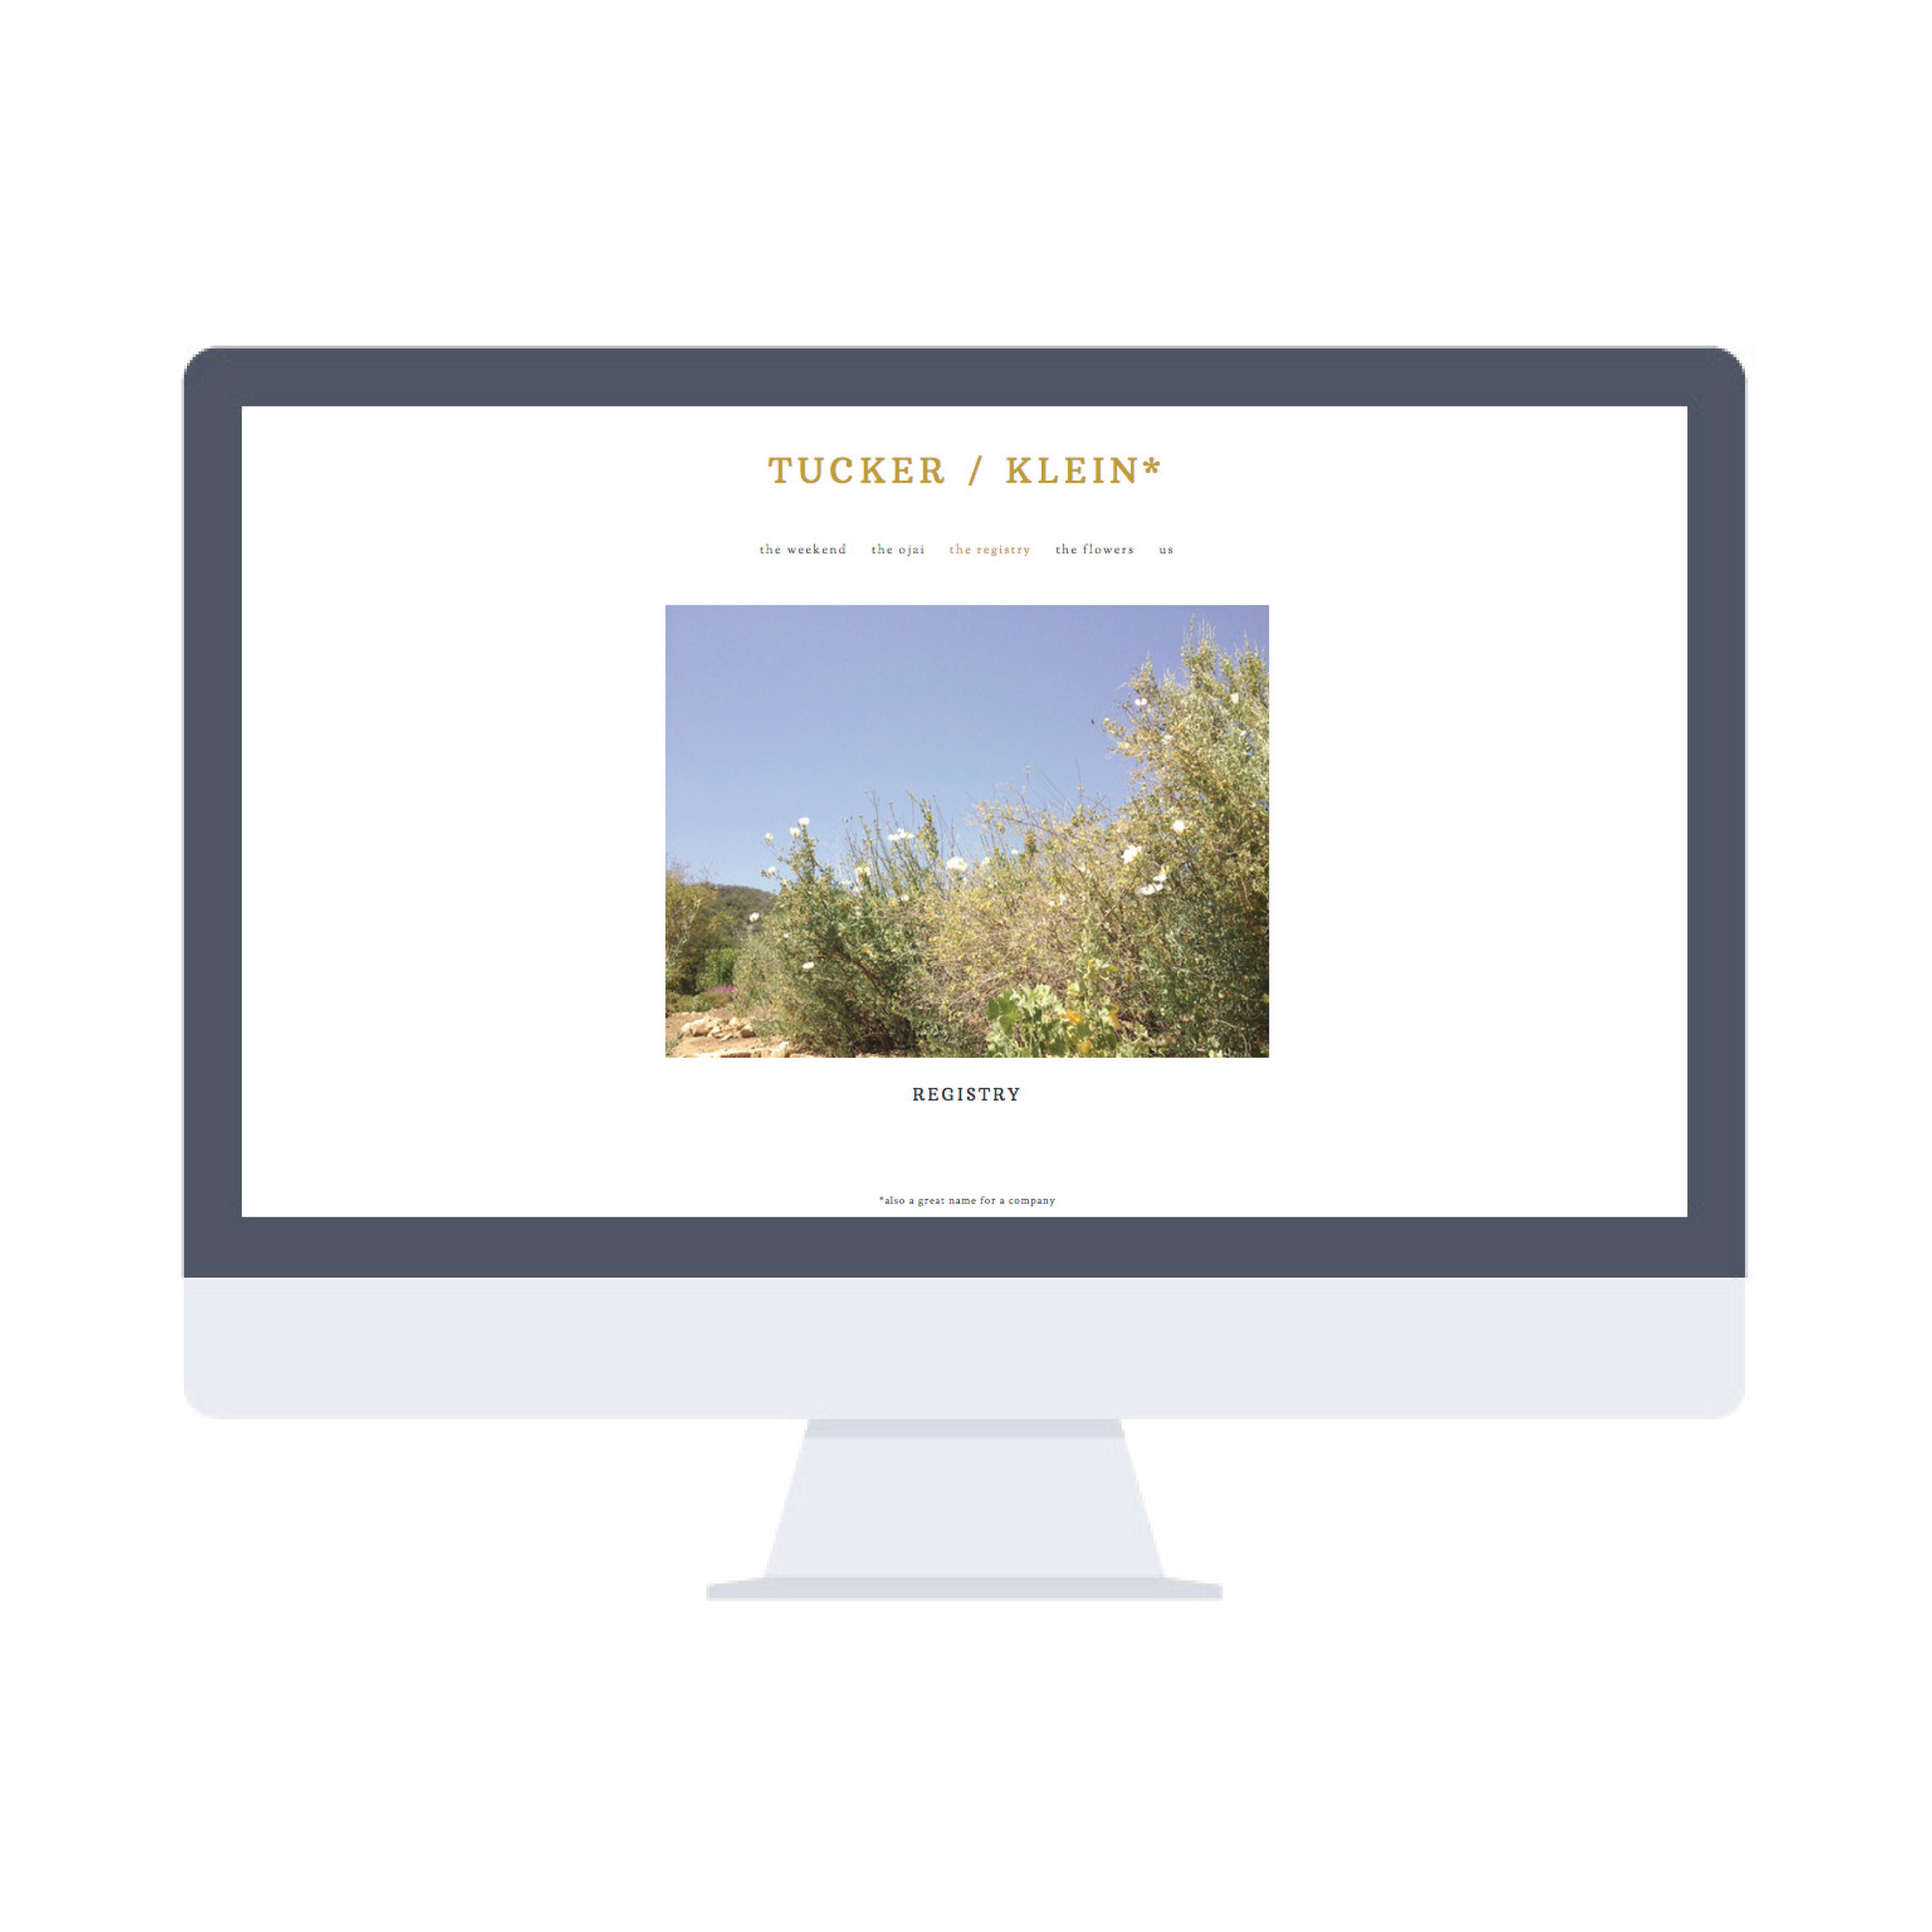 TUCKER-KLEIN web-3.jpg